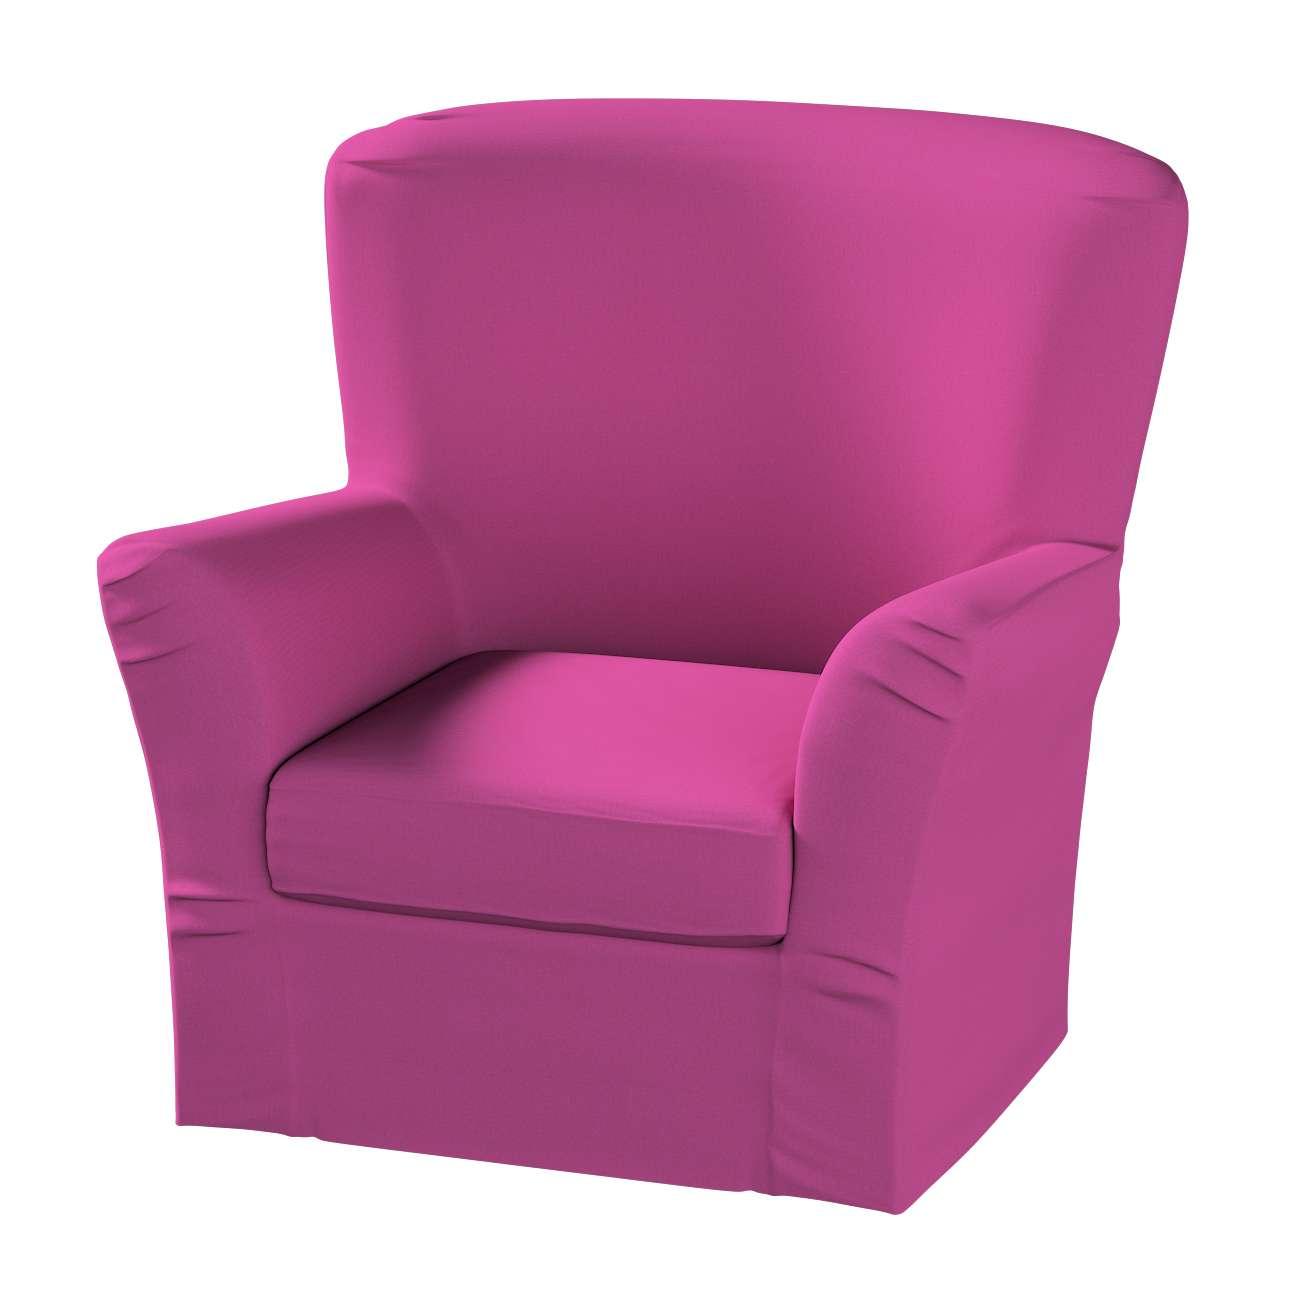 TOMELILLA fotelio užvalkalas TOMELILLA fotelis kolekcijoje Etna , audinys: 705-23